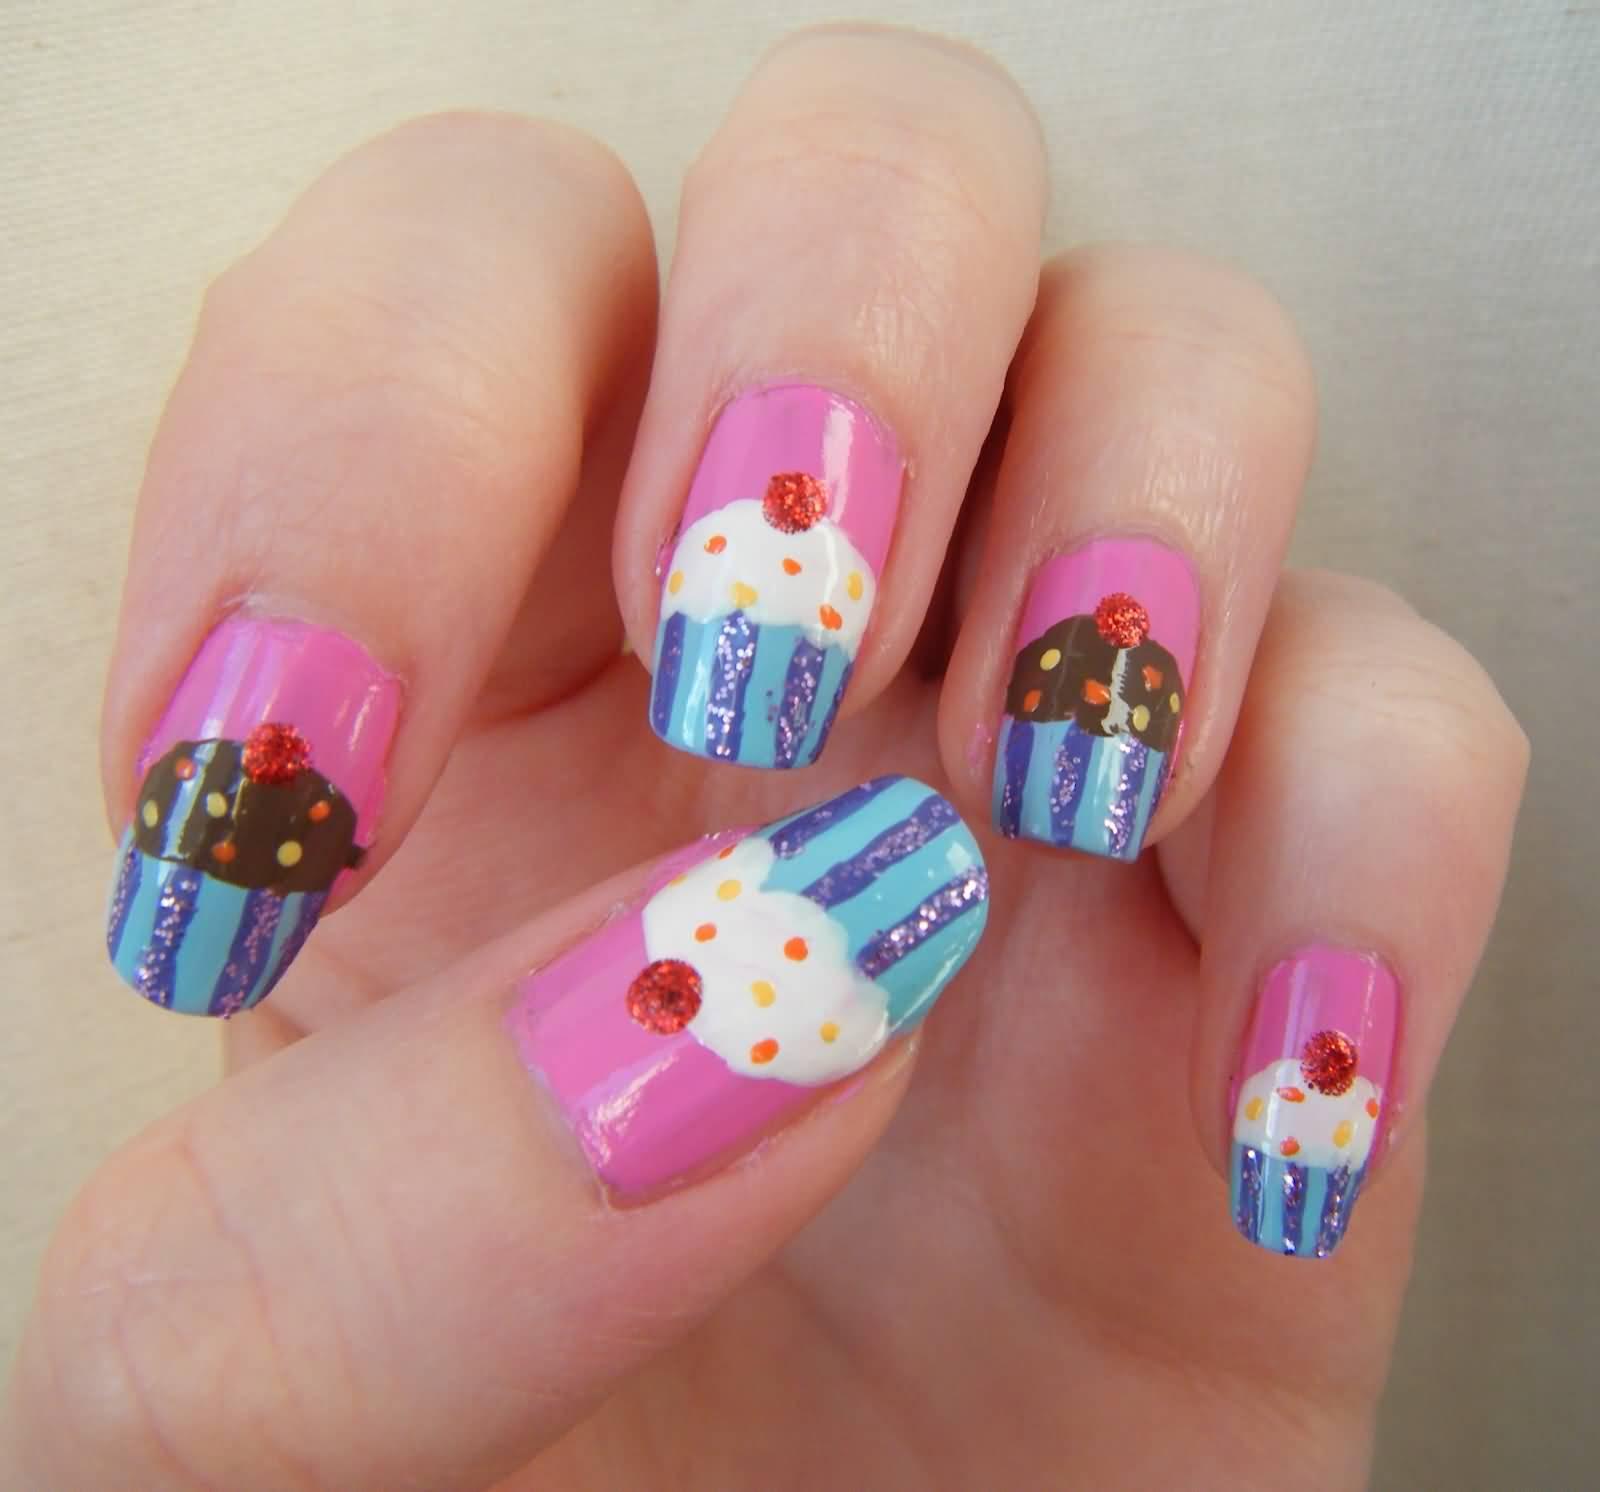 51 Wonderful Cupcake Nail Art Design Ideas For Girls